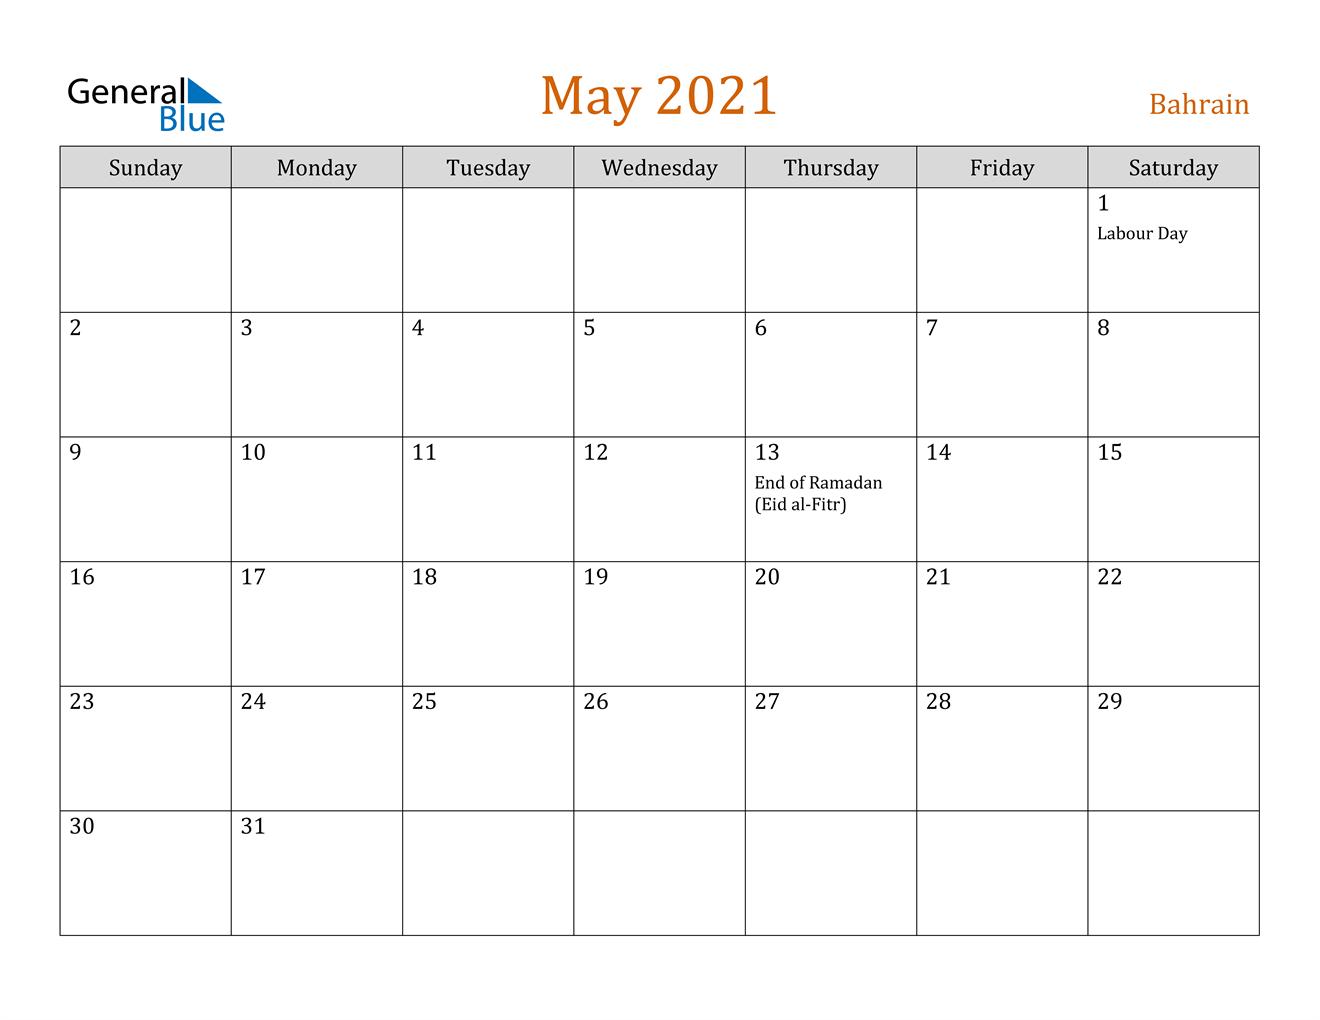 May 2021 Calendar - Bahrain